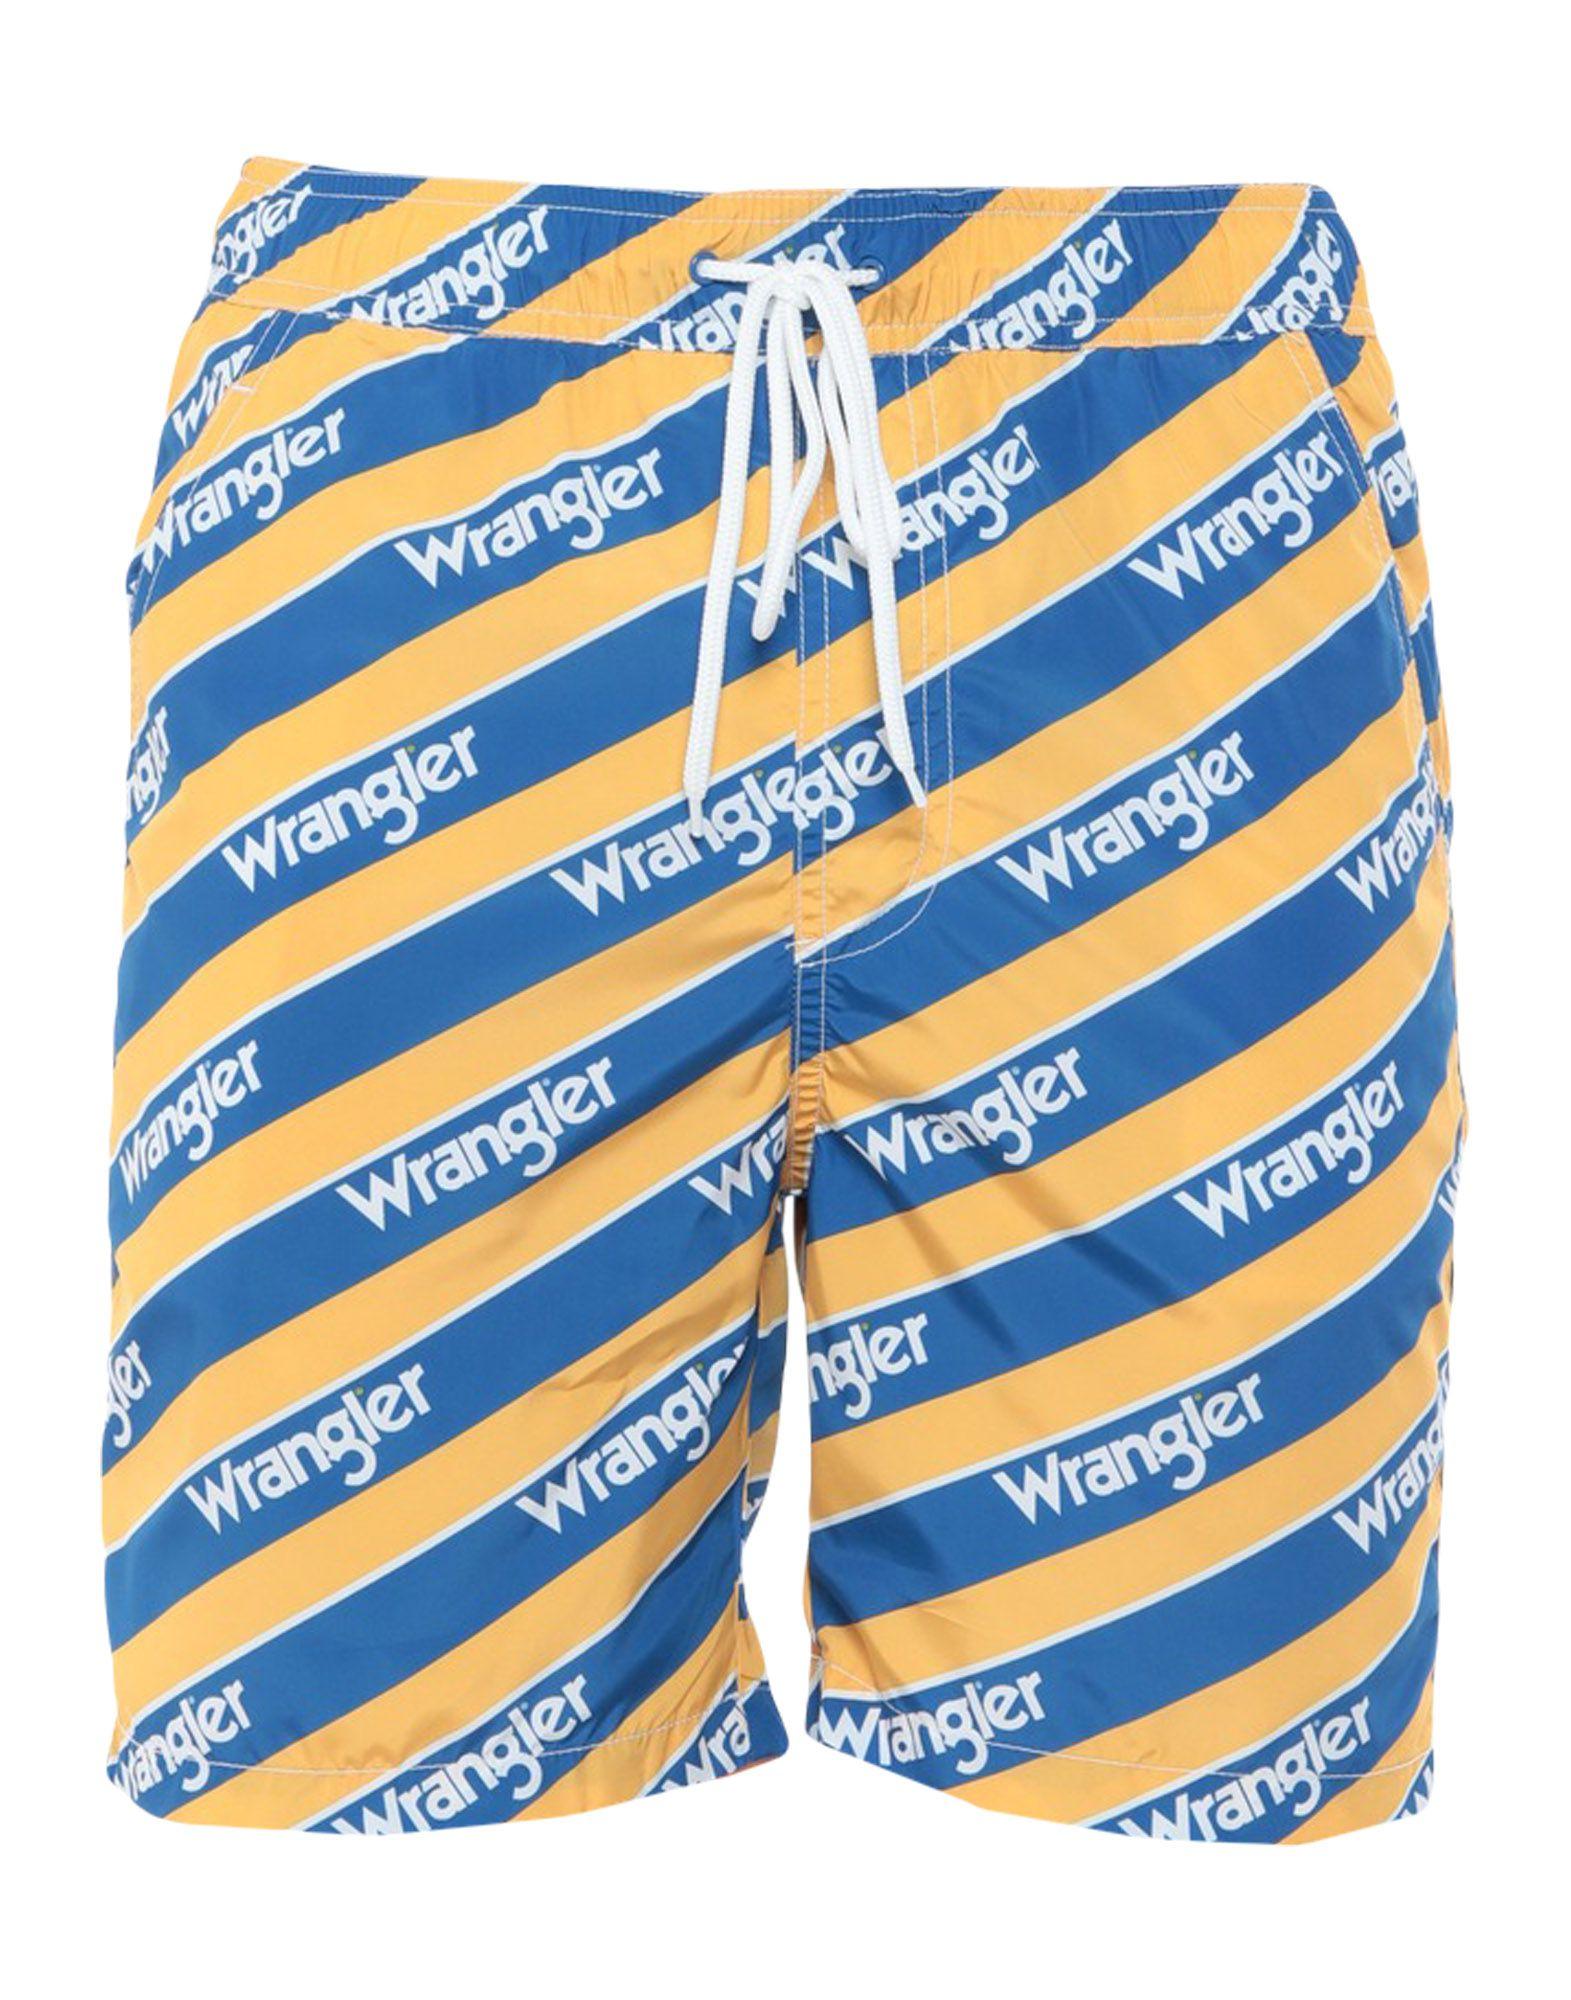 e7b4567e07ea1 Wrangler Swim Shorts - Men Wrangler Swim Shorts online on YOOX United  States - 47234846FS